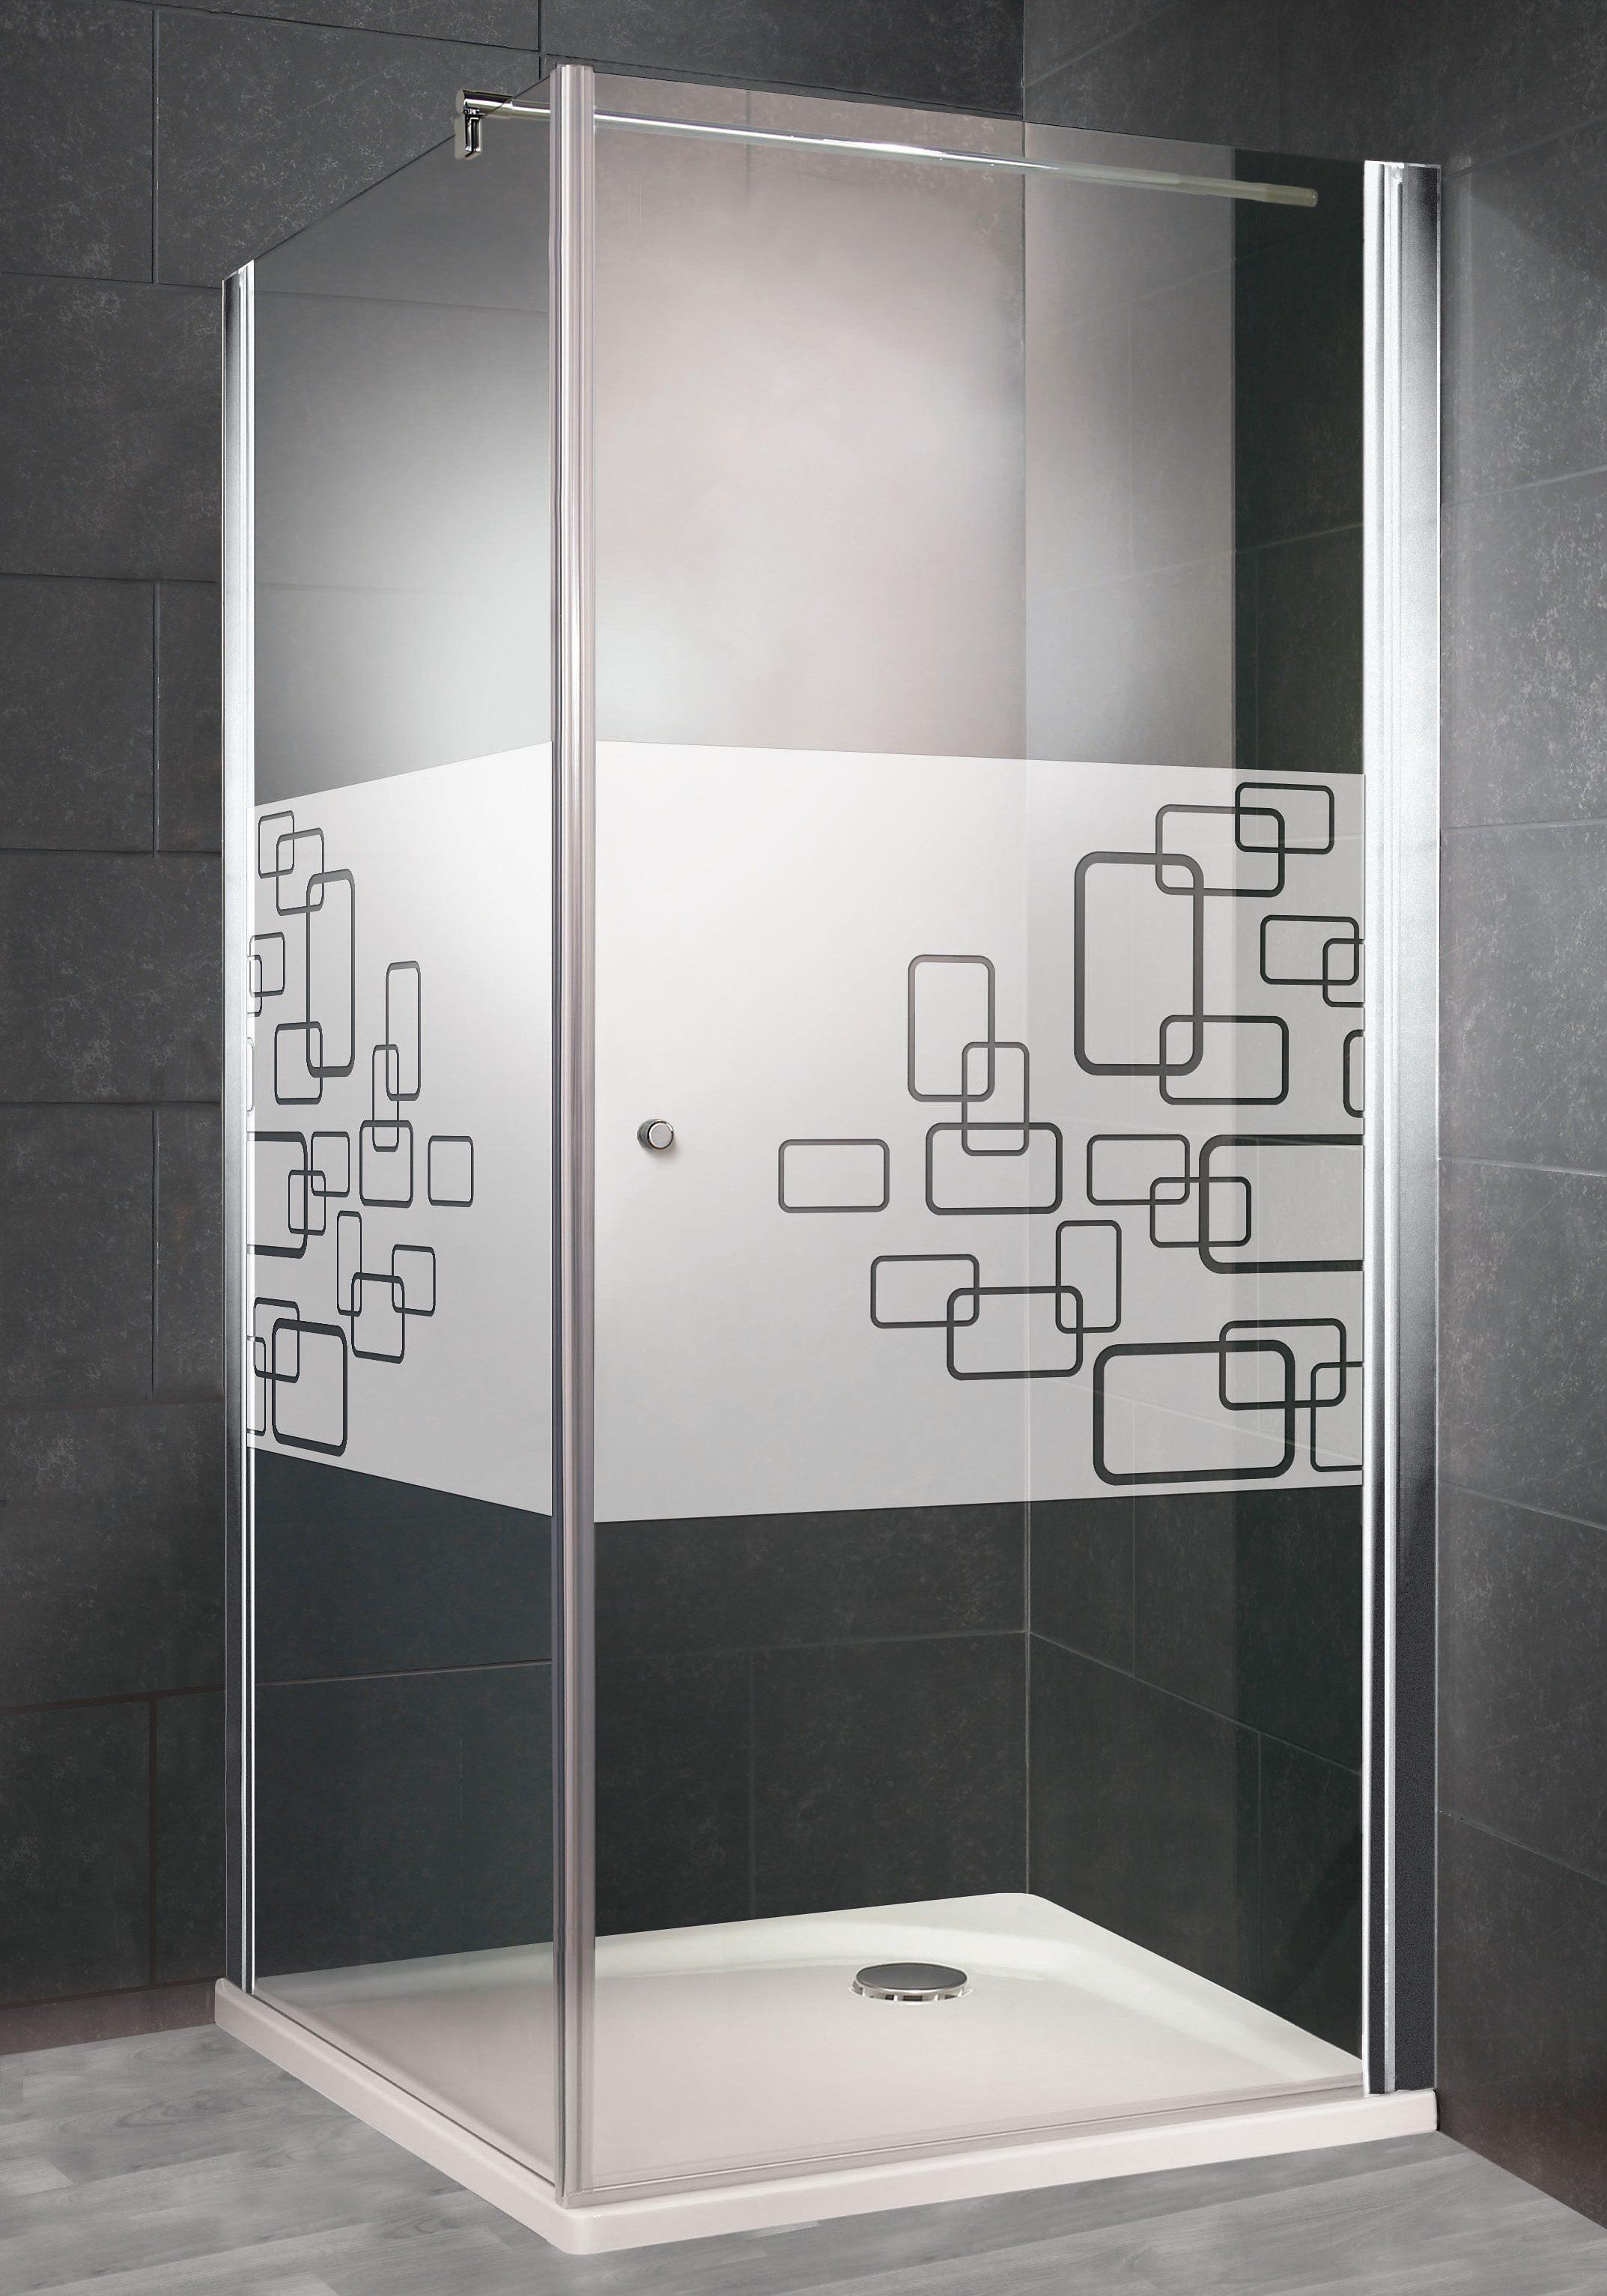 Schulte Eckdusche »Alexa Style 2.0«, 90 cm x 90 cm